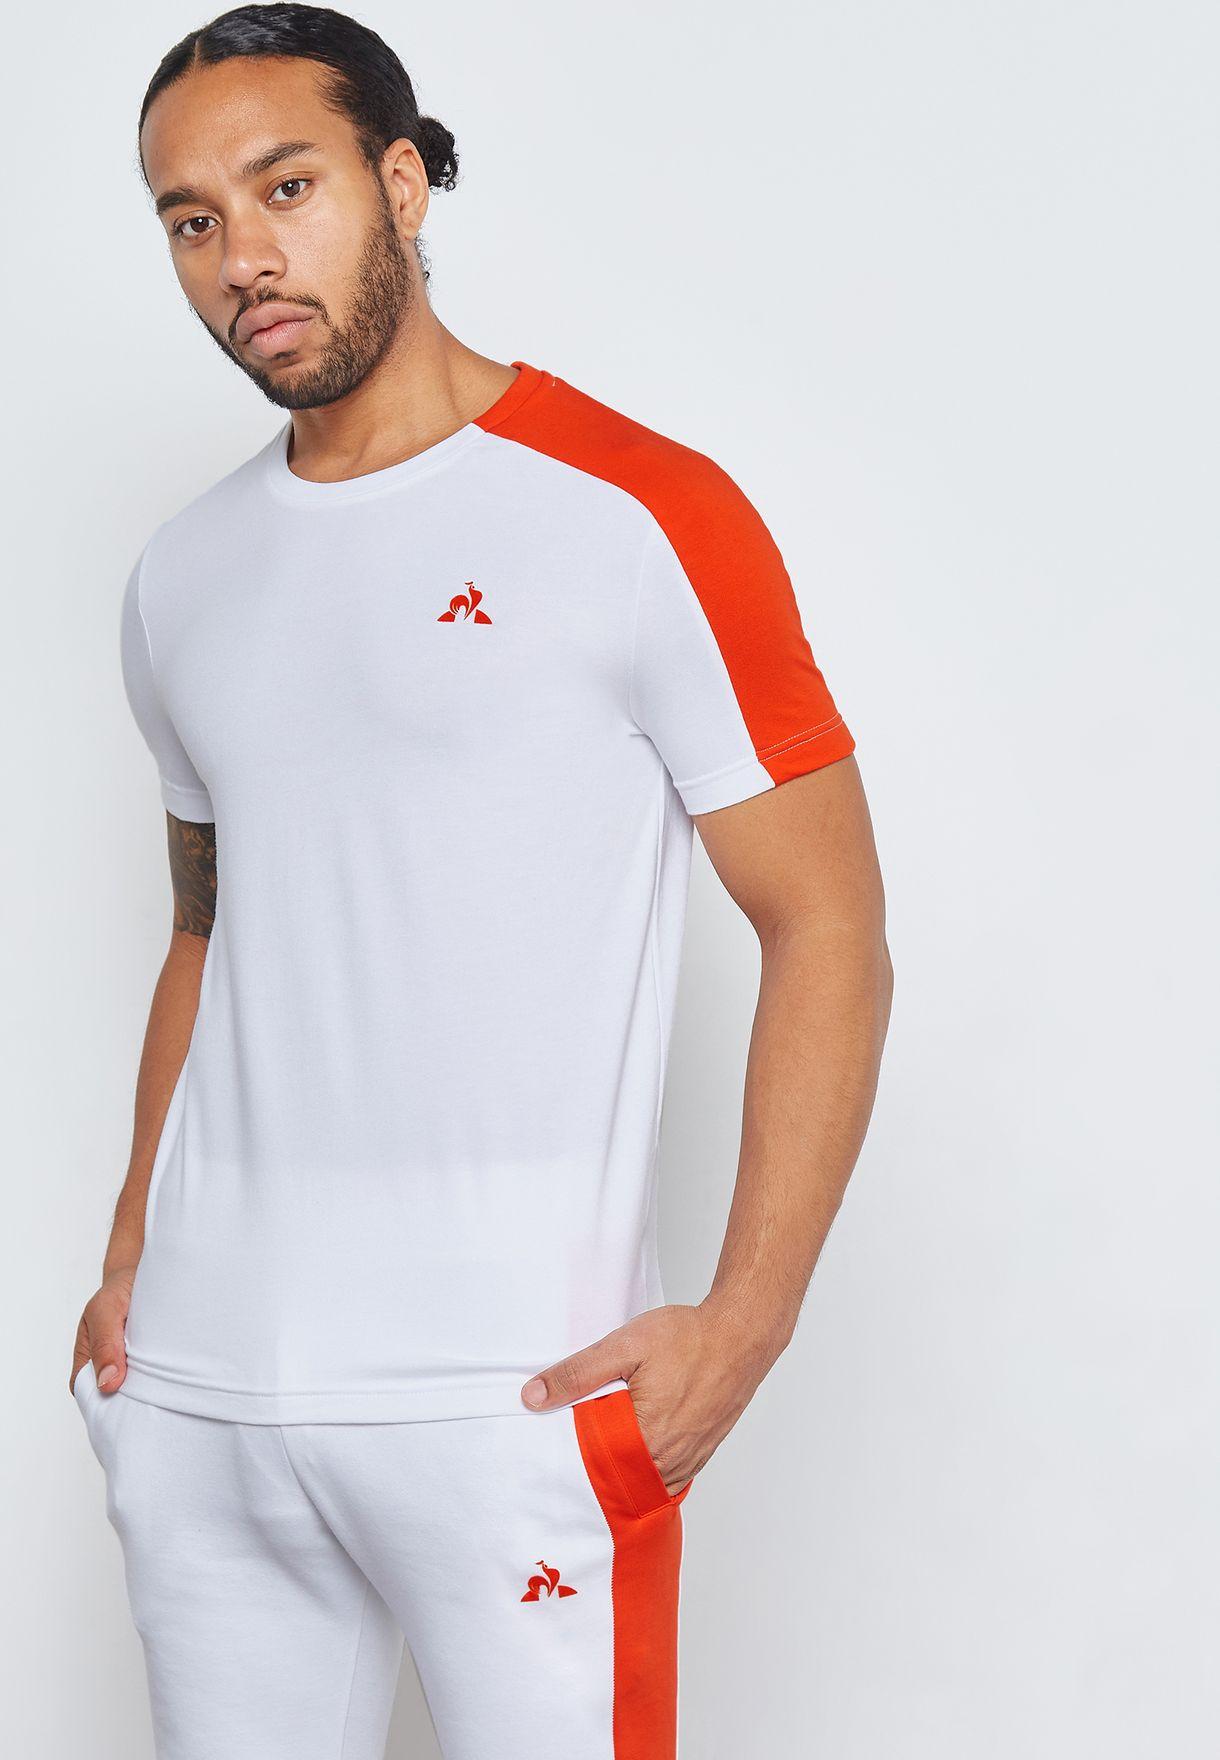 c88d020fa8 Shop Le Coq Sportif white Saison T-Shirt 1820042 for Men in Saudi ...